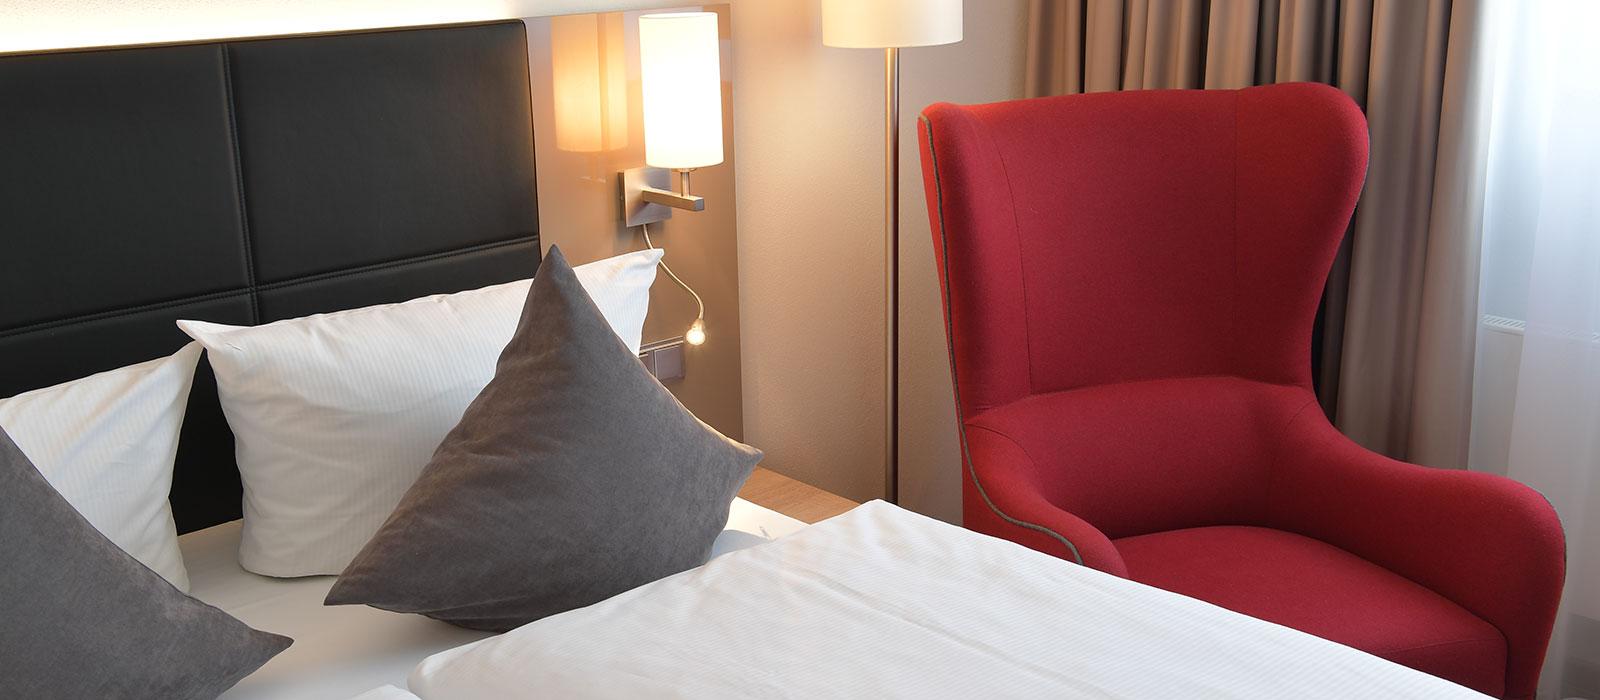 Hotelzimmer & Preise